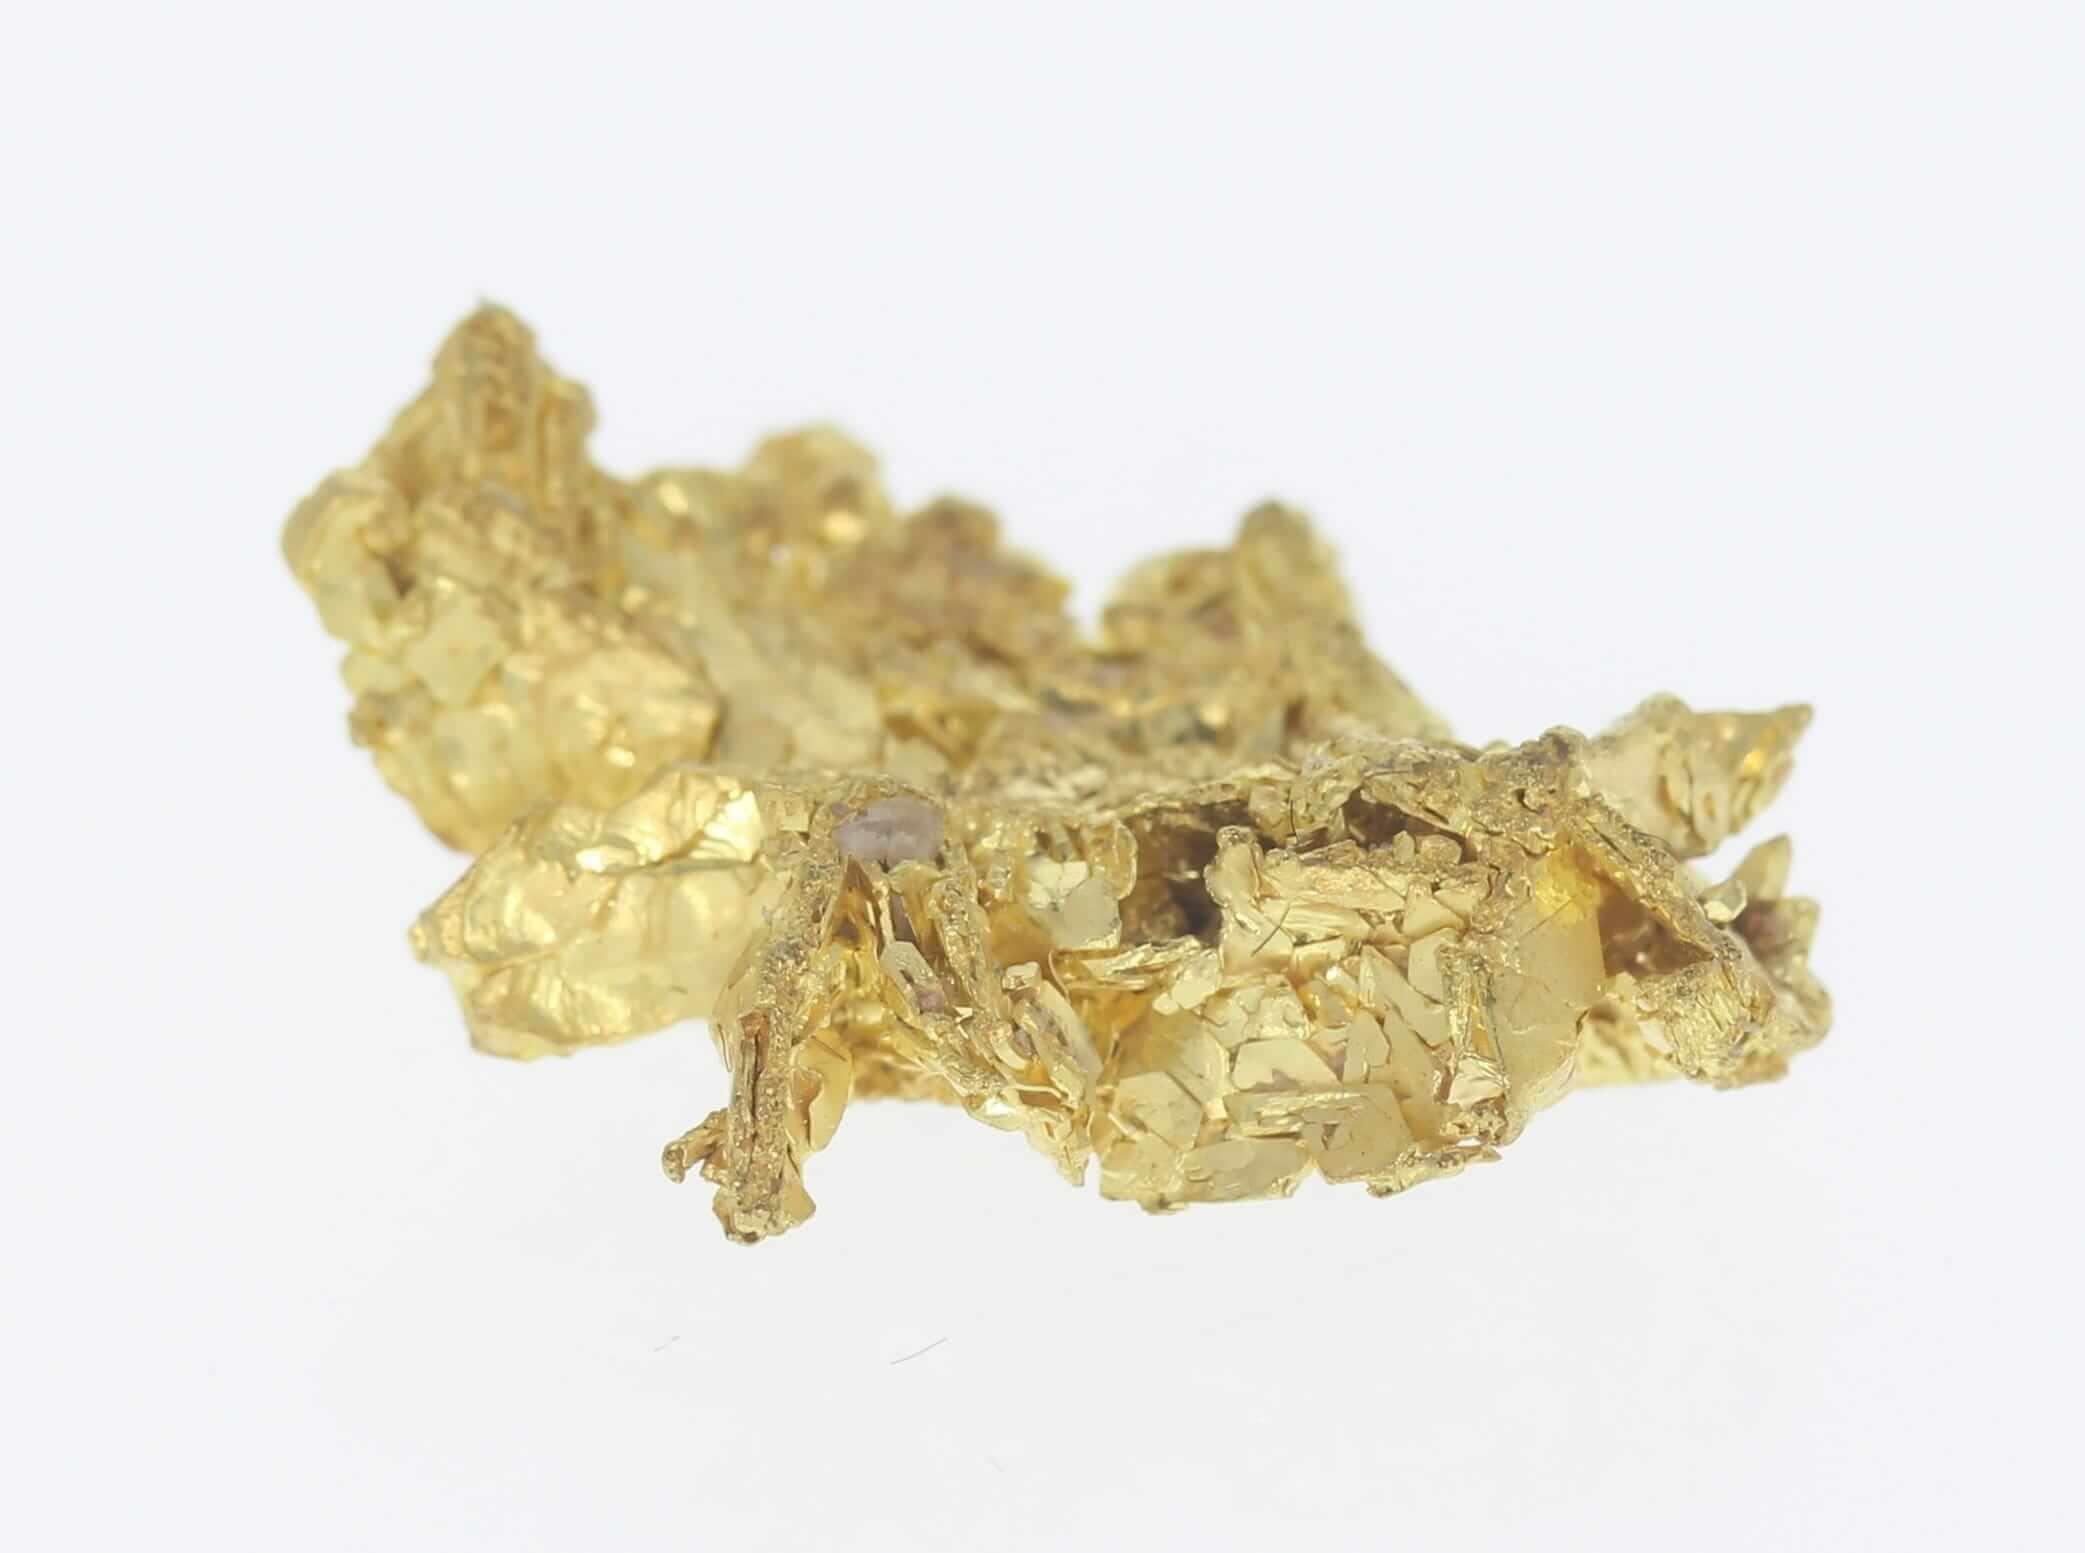 Natural Western Australian Gold Nugget - Crystalline Gold - 3.33g 3